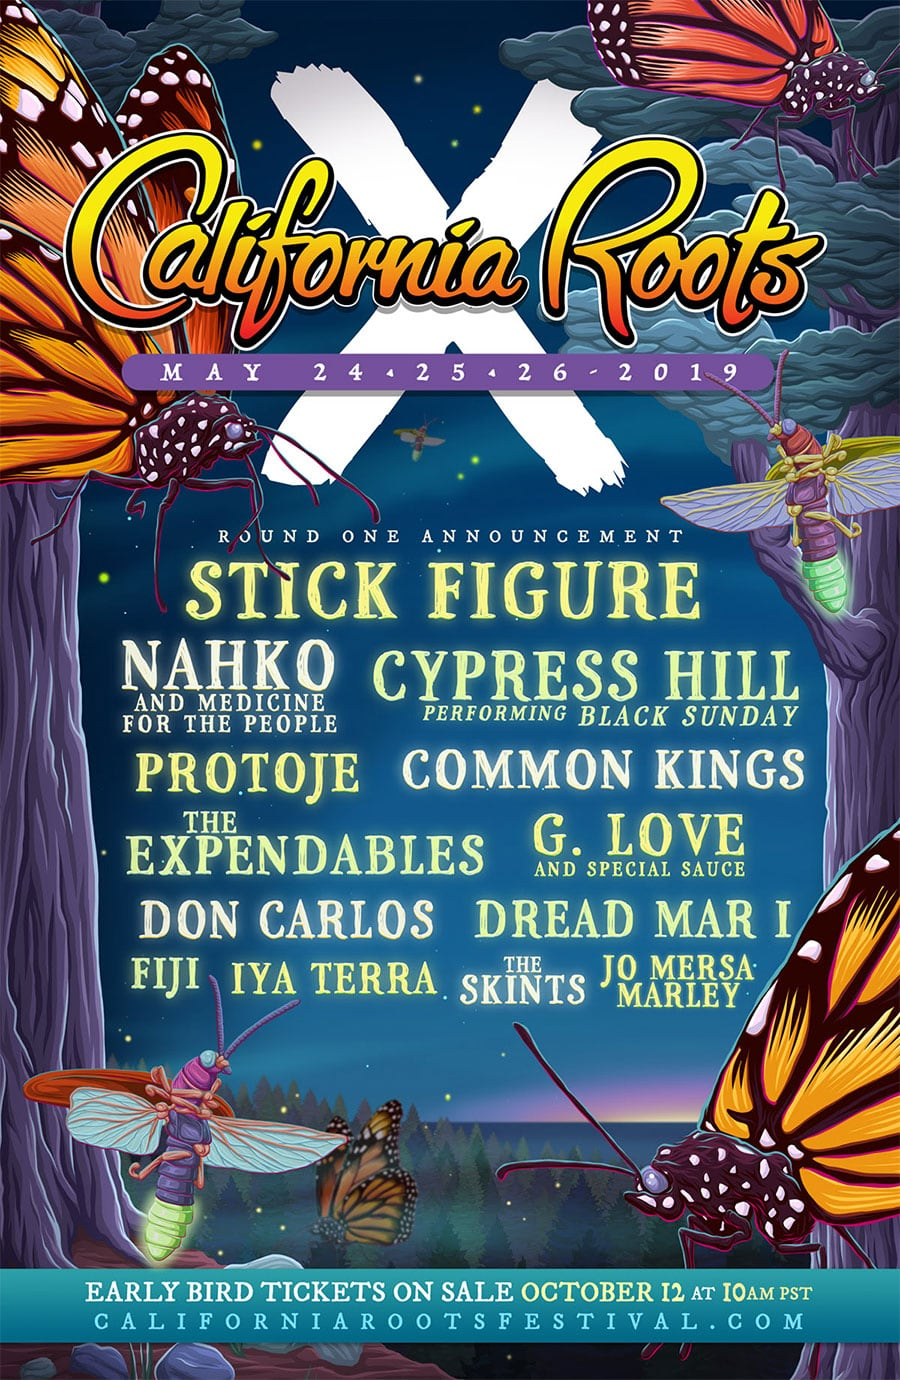 California Roots Music & Arts Festival 2019